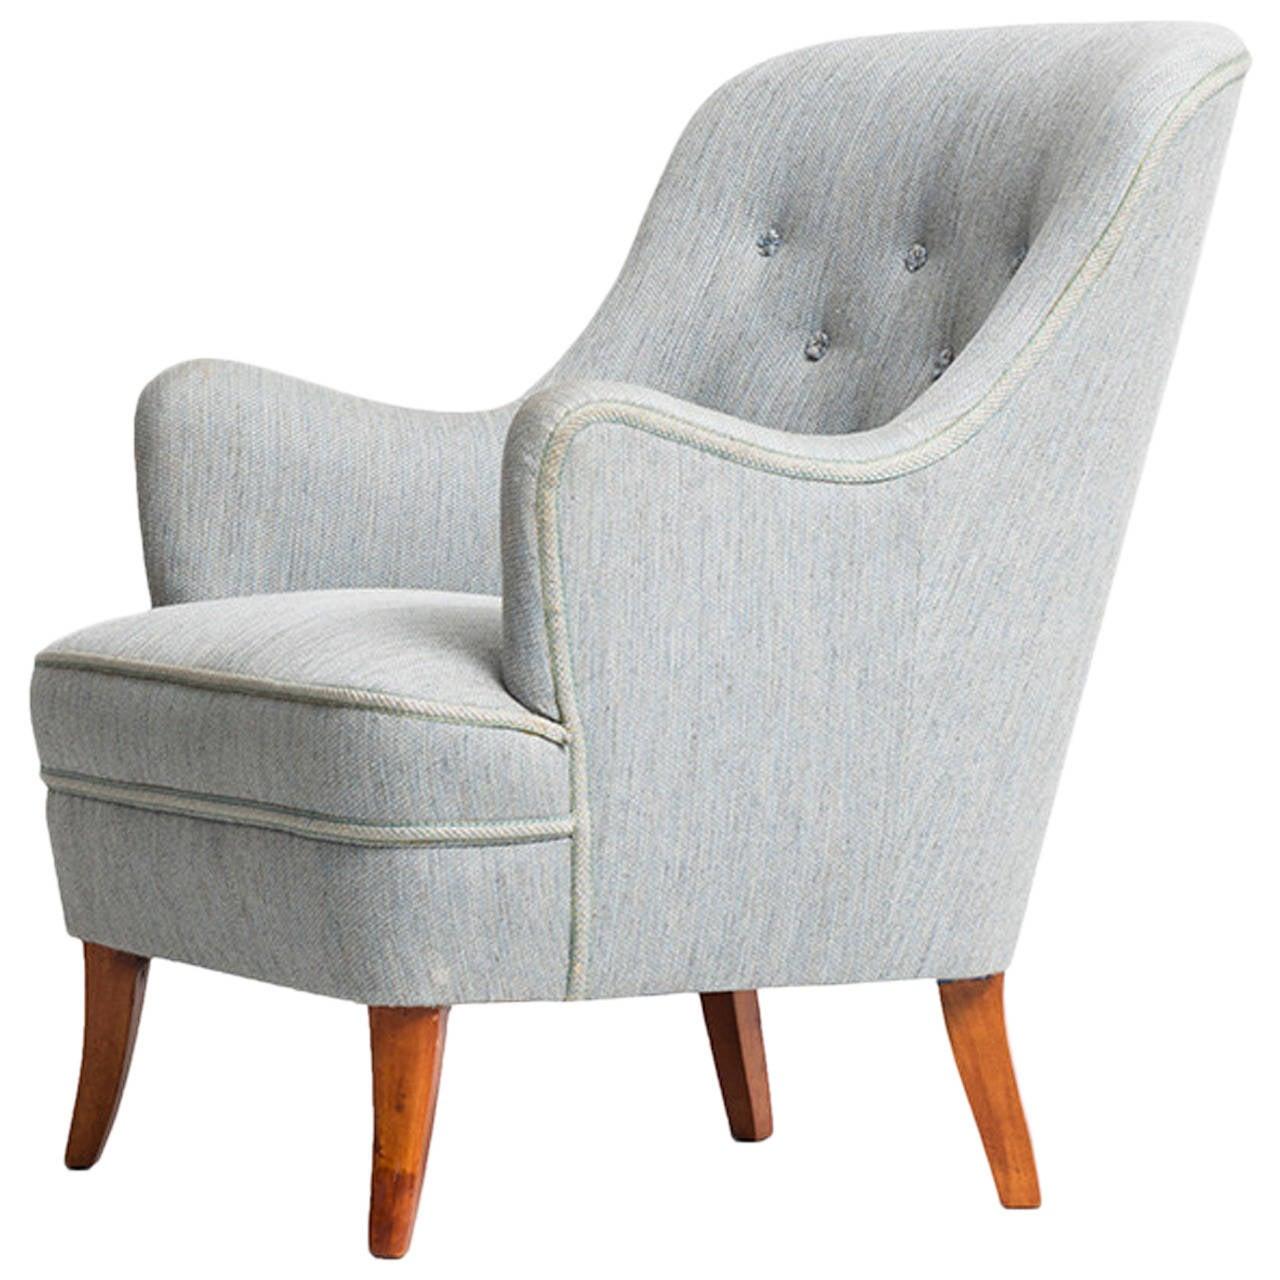 Carl Malmsten Easy Chair by O.H Sjögren in Sweden For Sale